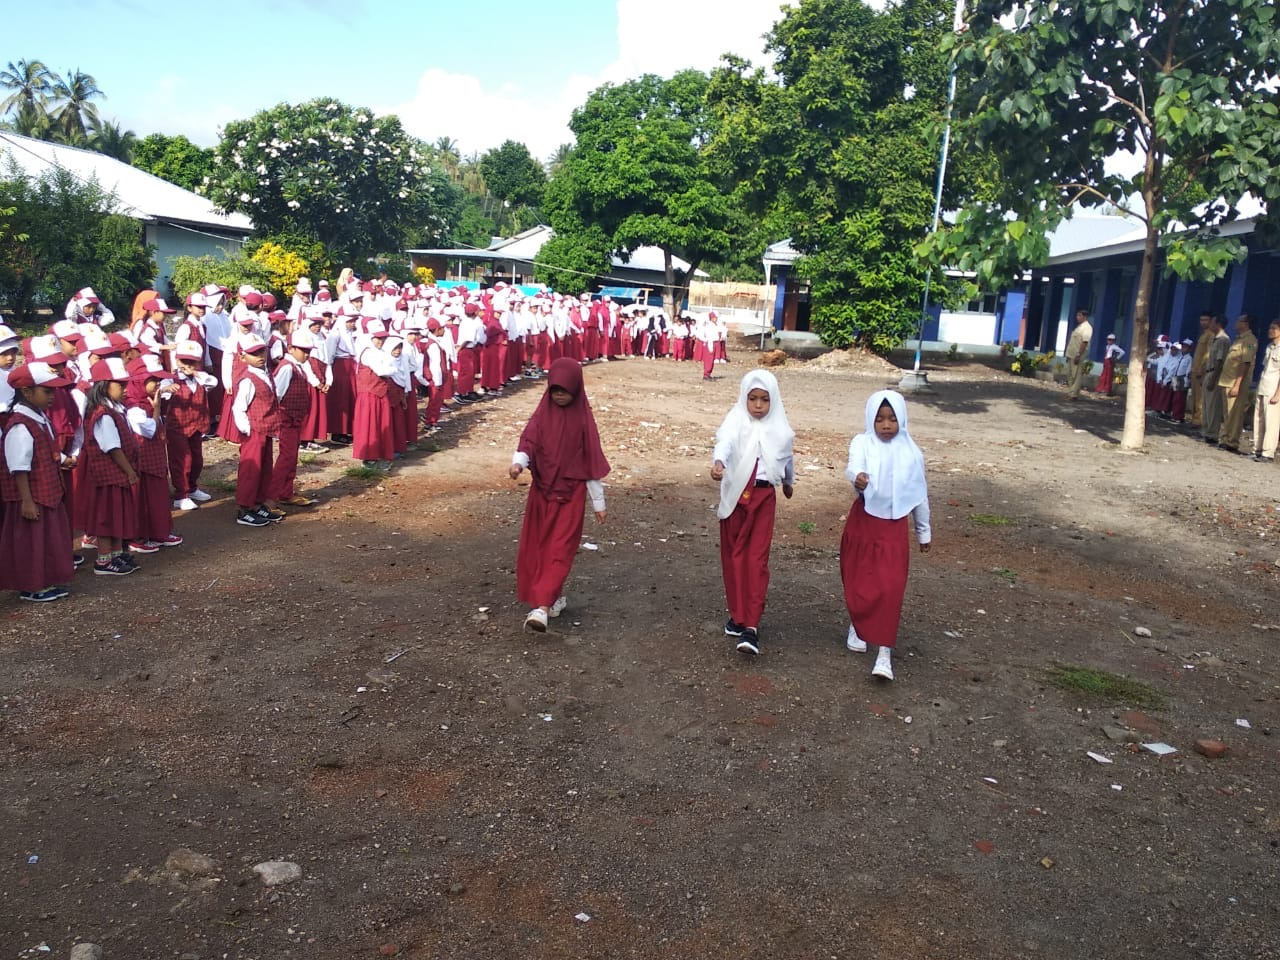 Image of school girls in uniform at a school parade